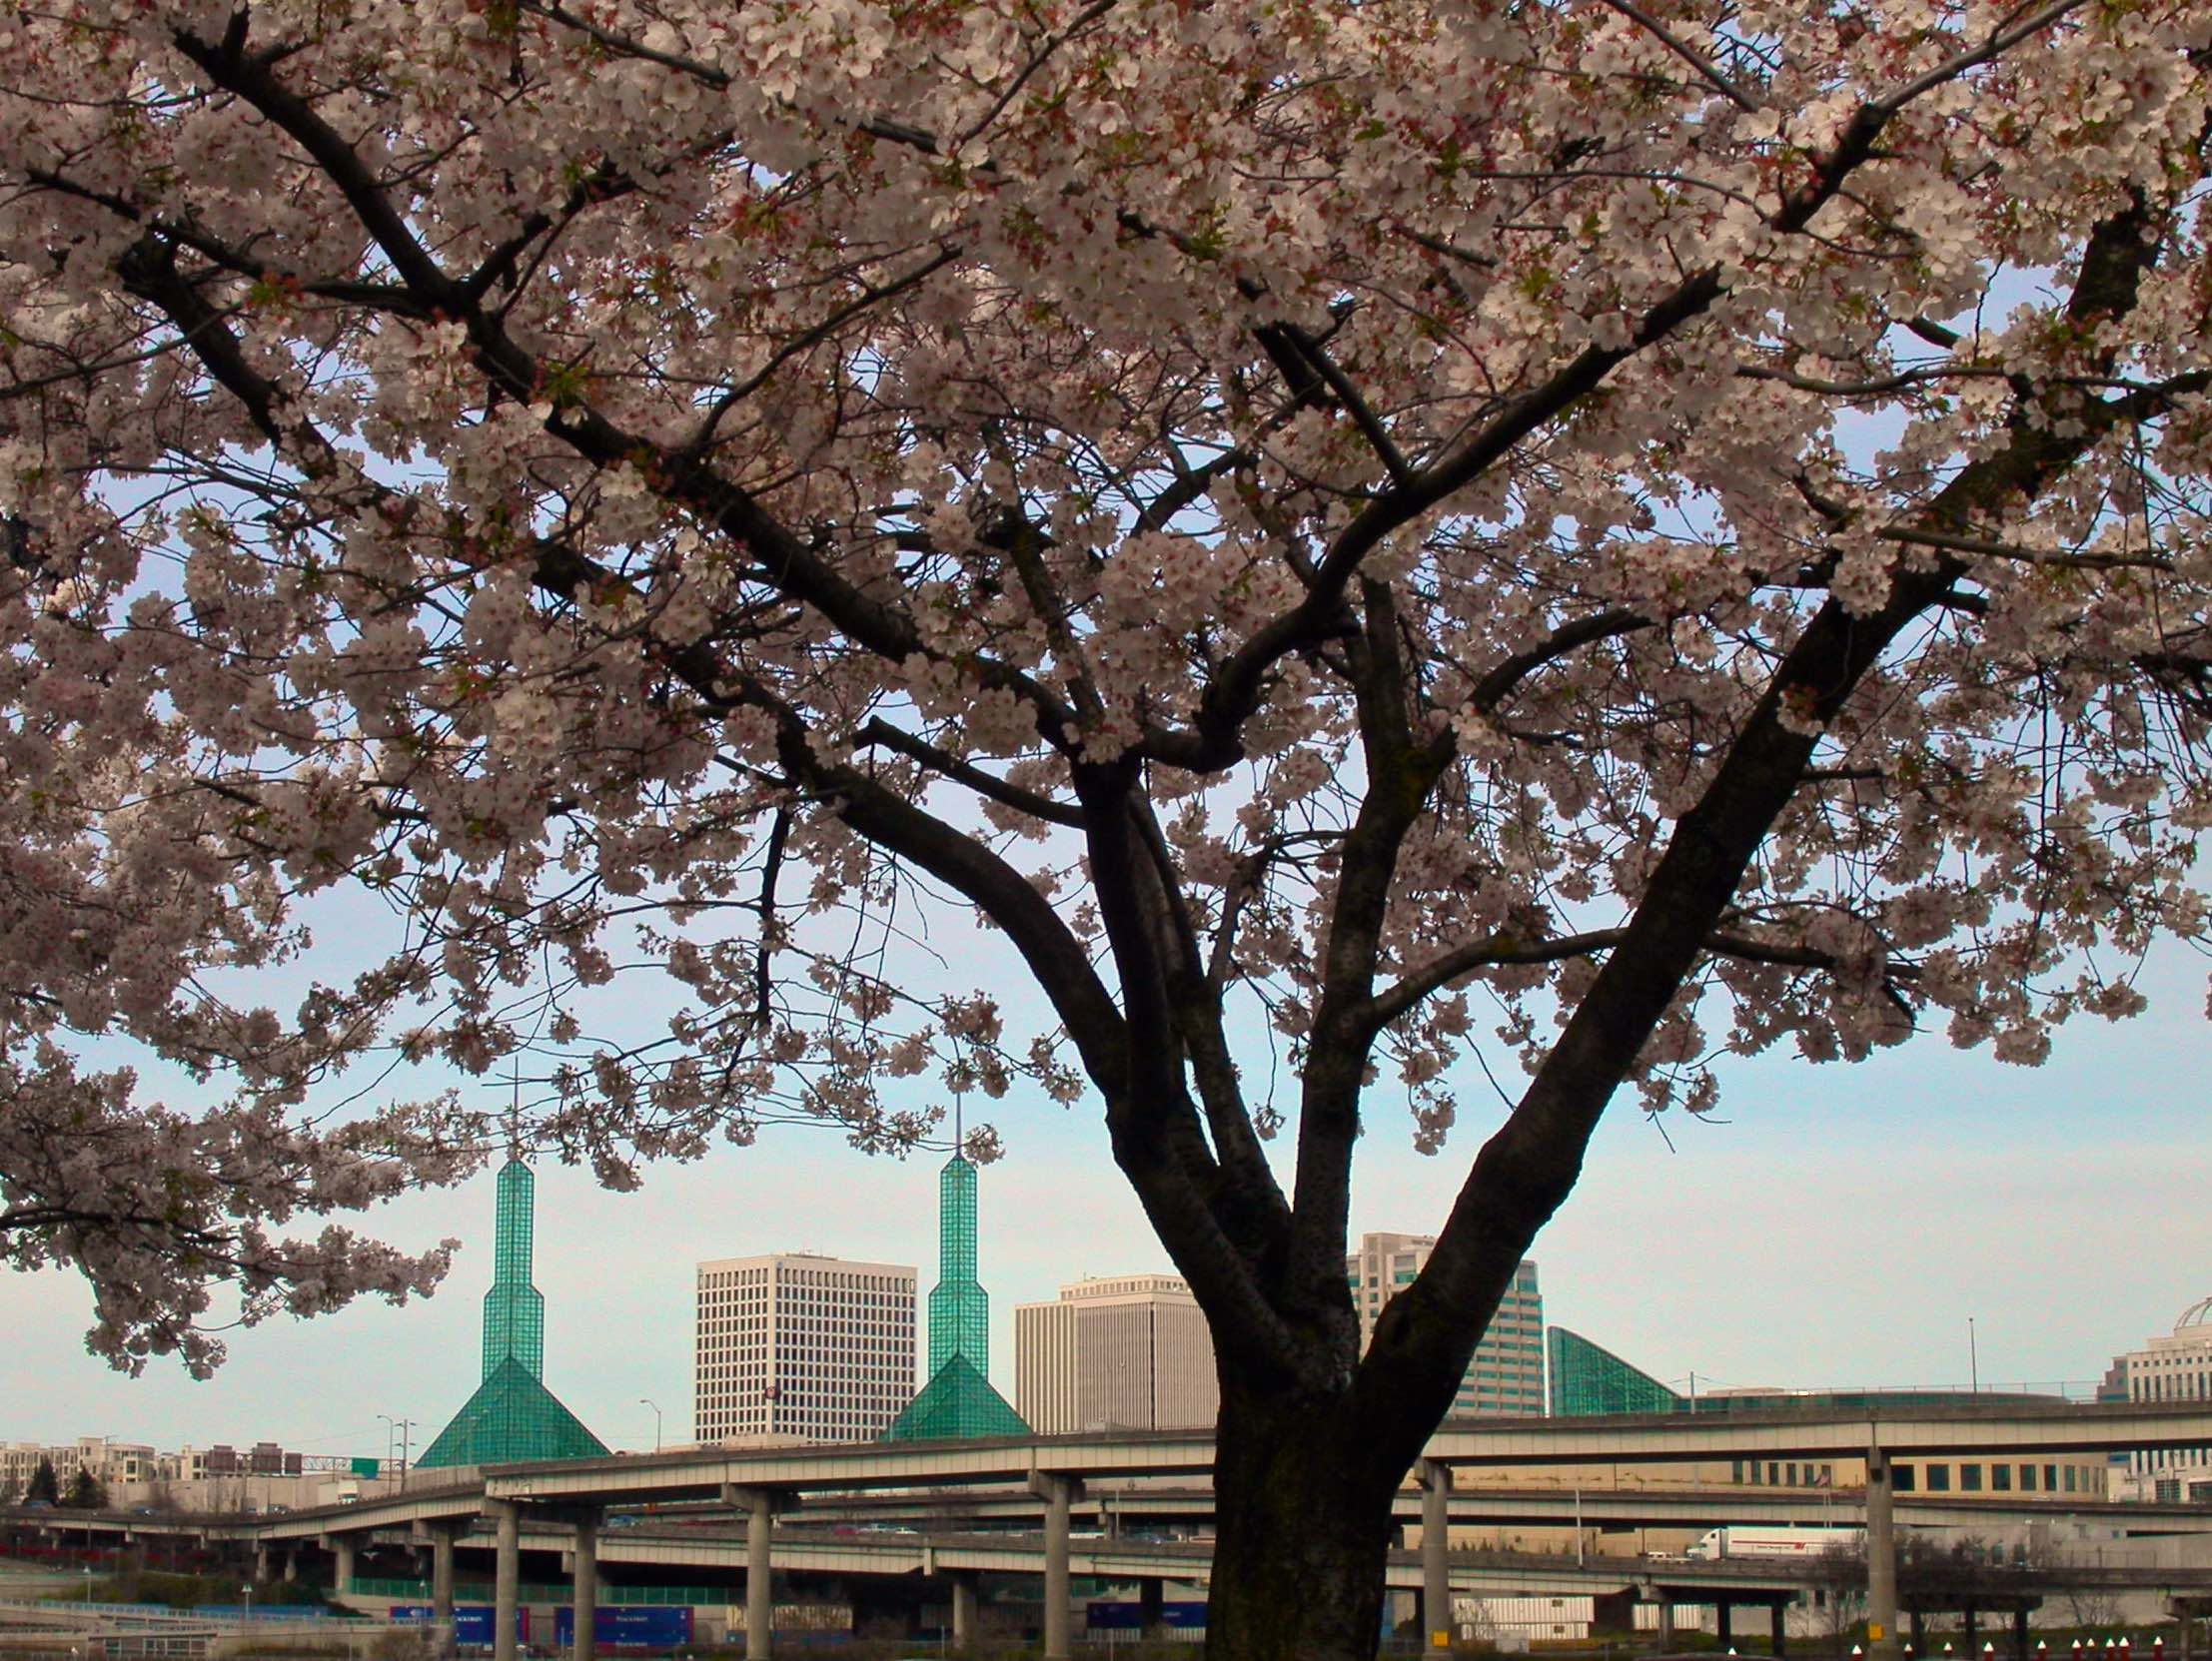 Japanese Cherry Blossoms frame the Portland Convention Center